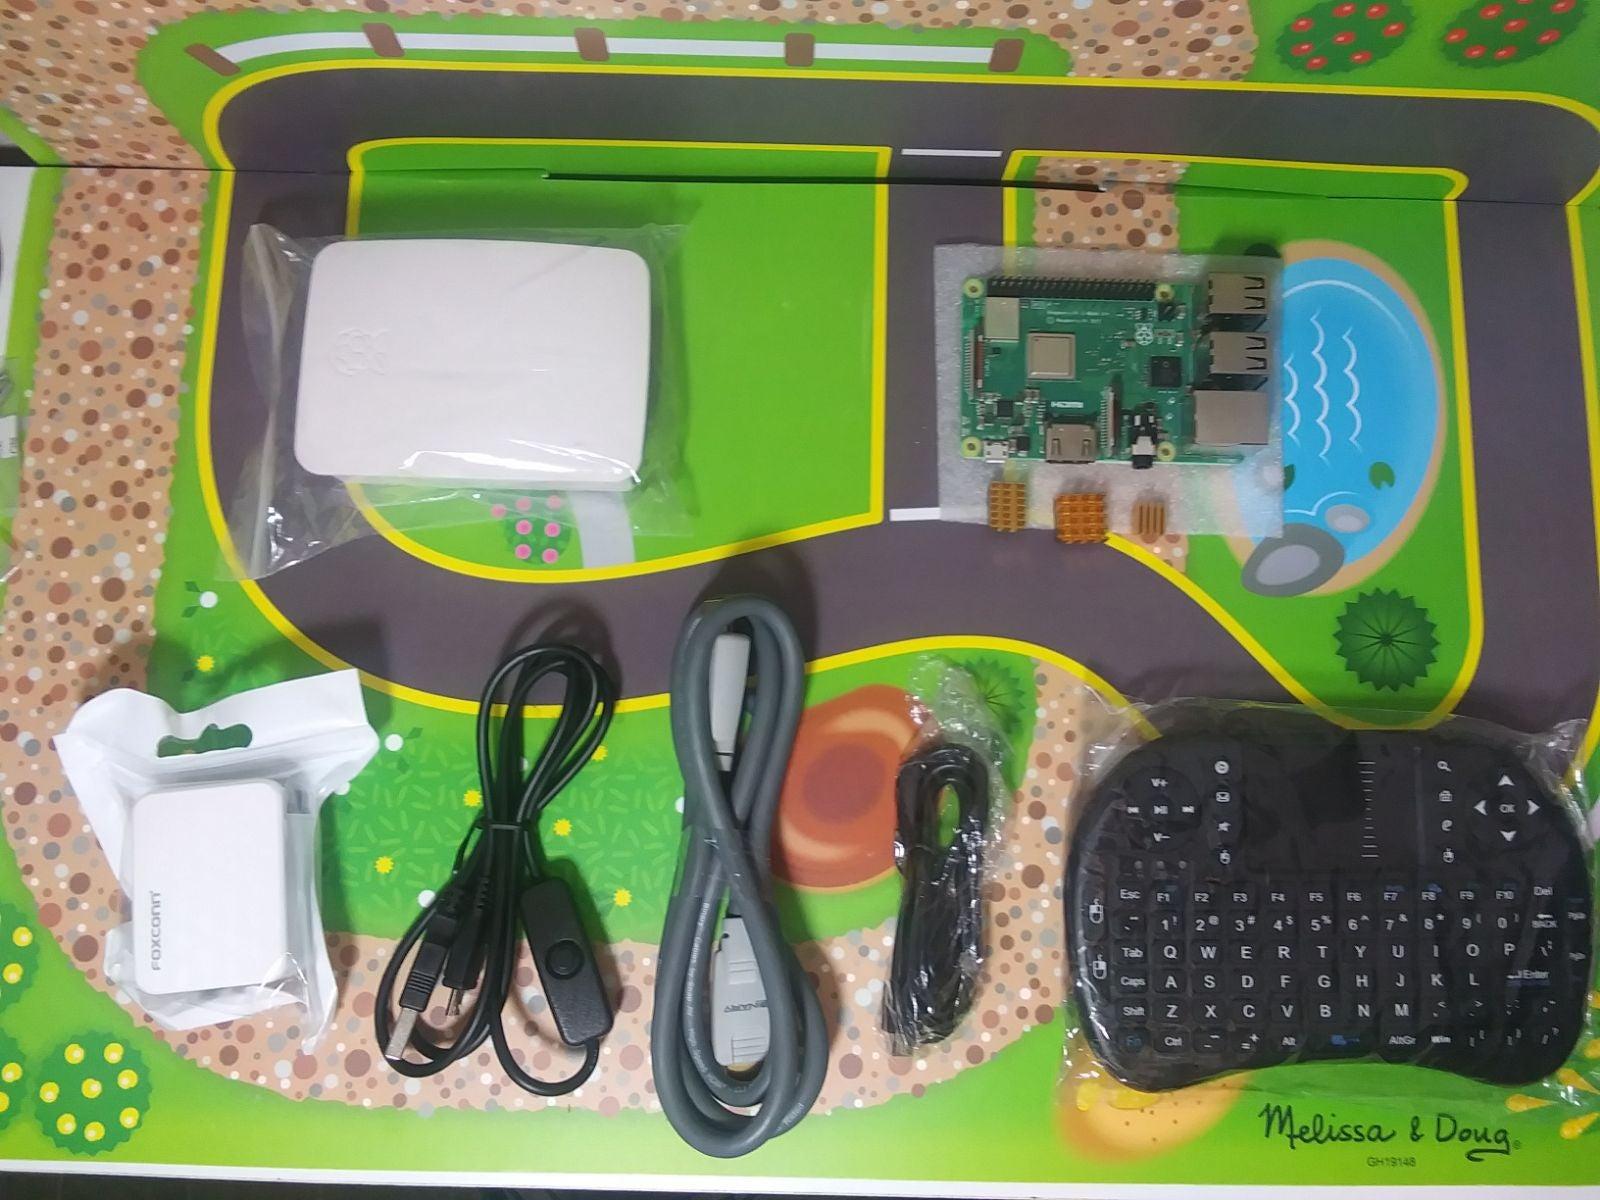 Raspberry Pi B 3 Plus Quality Build New